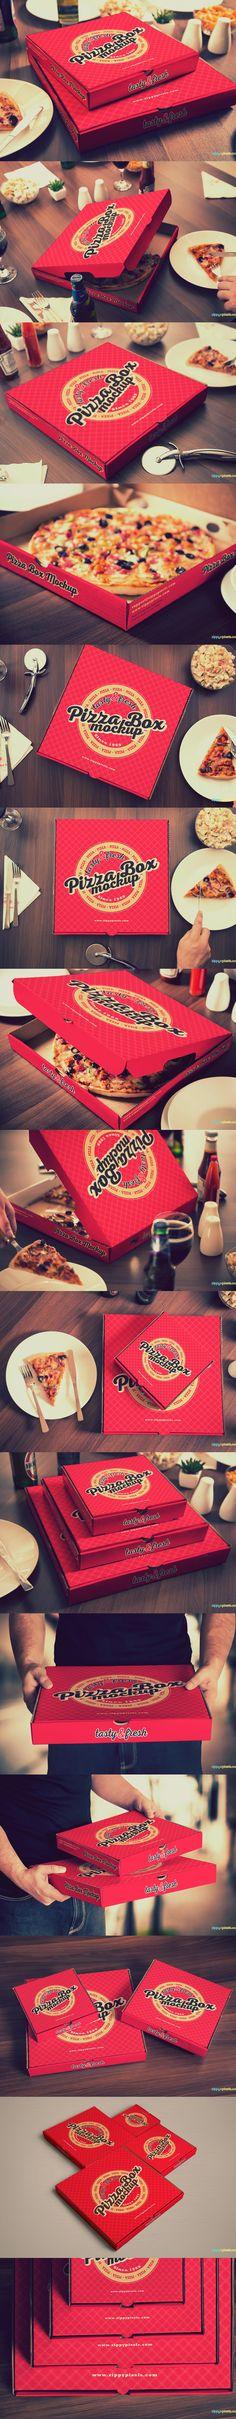 15 Yummy #Pizza Box #Mockups